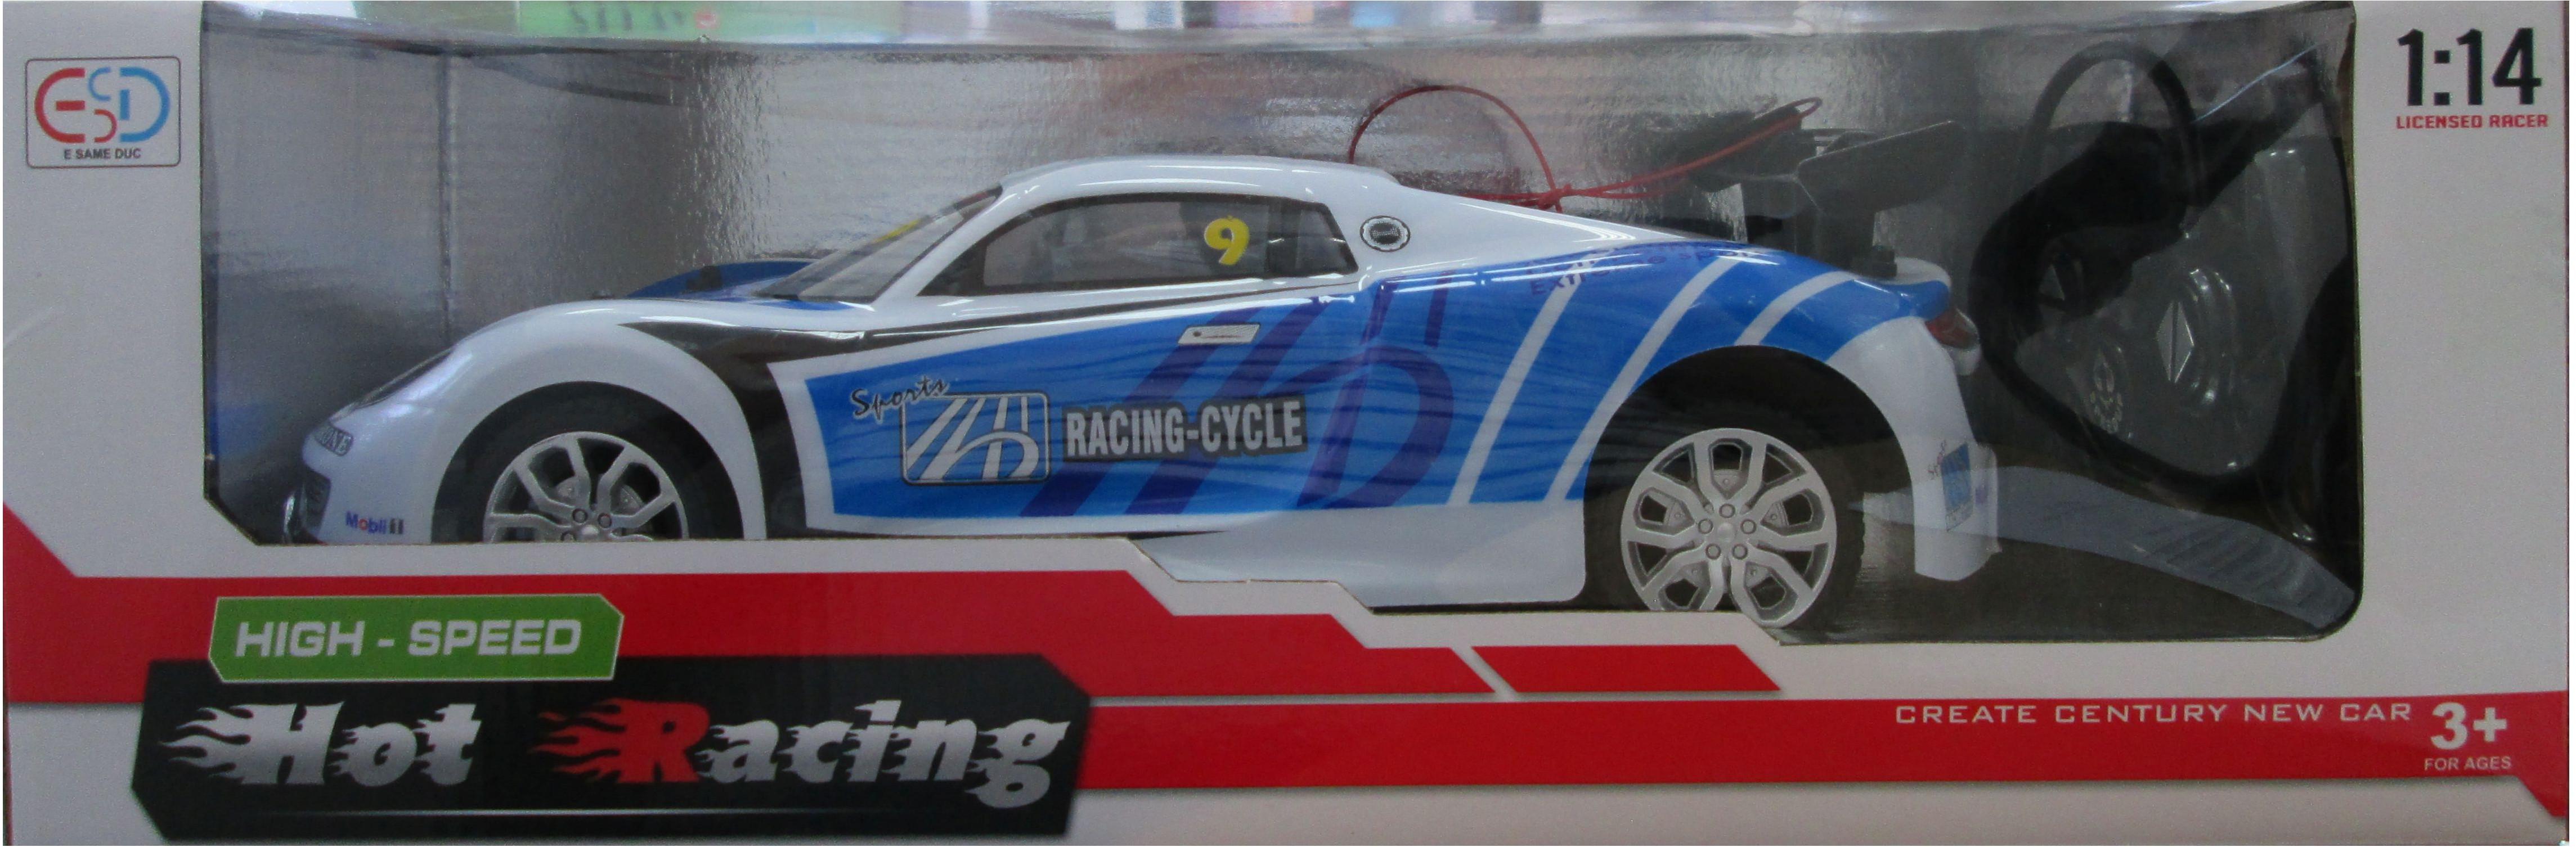 Mega Creative Auto wyścigowe R/C